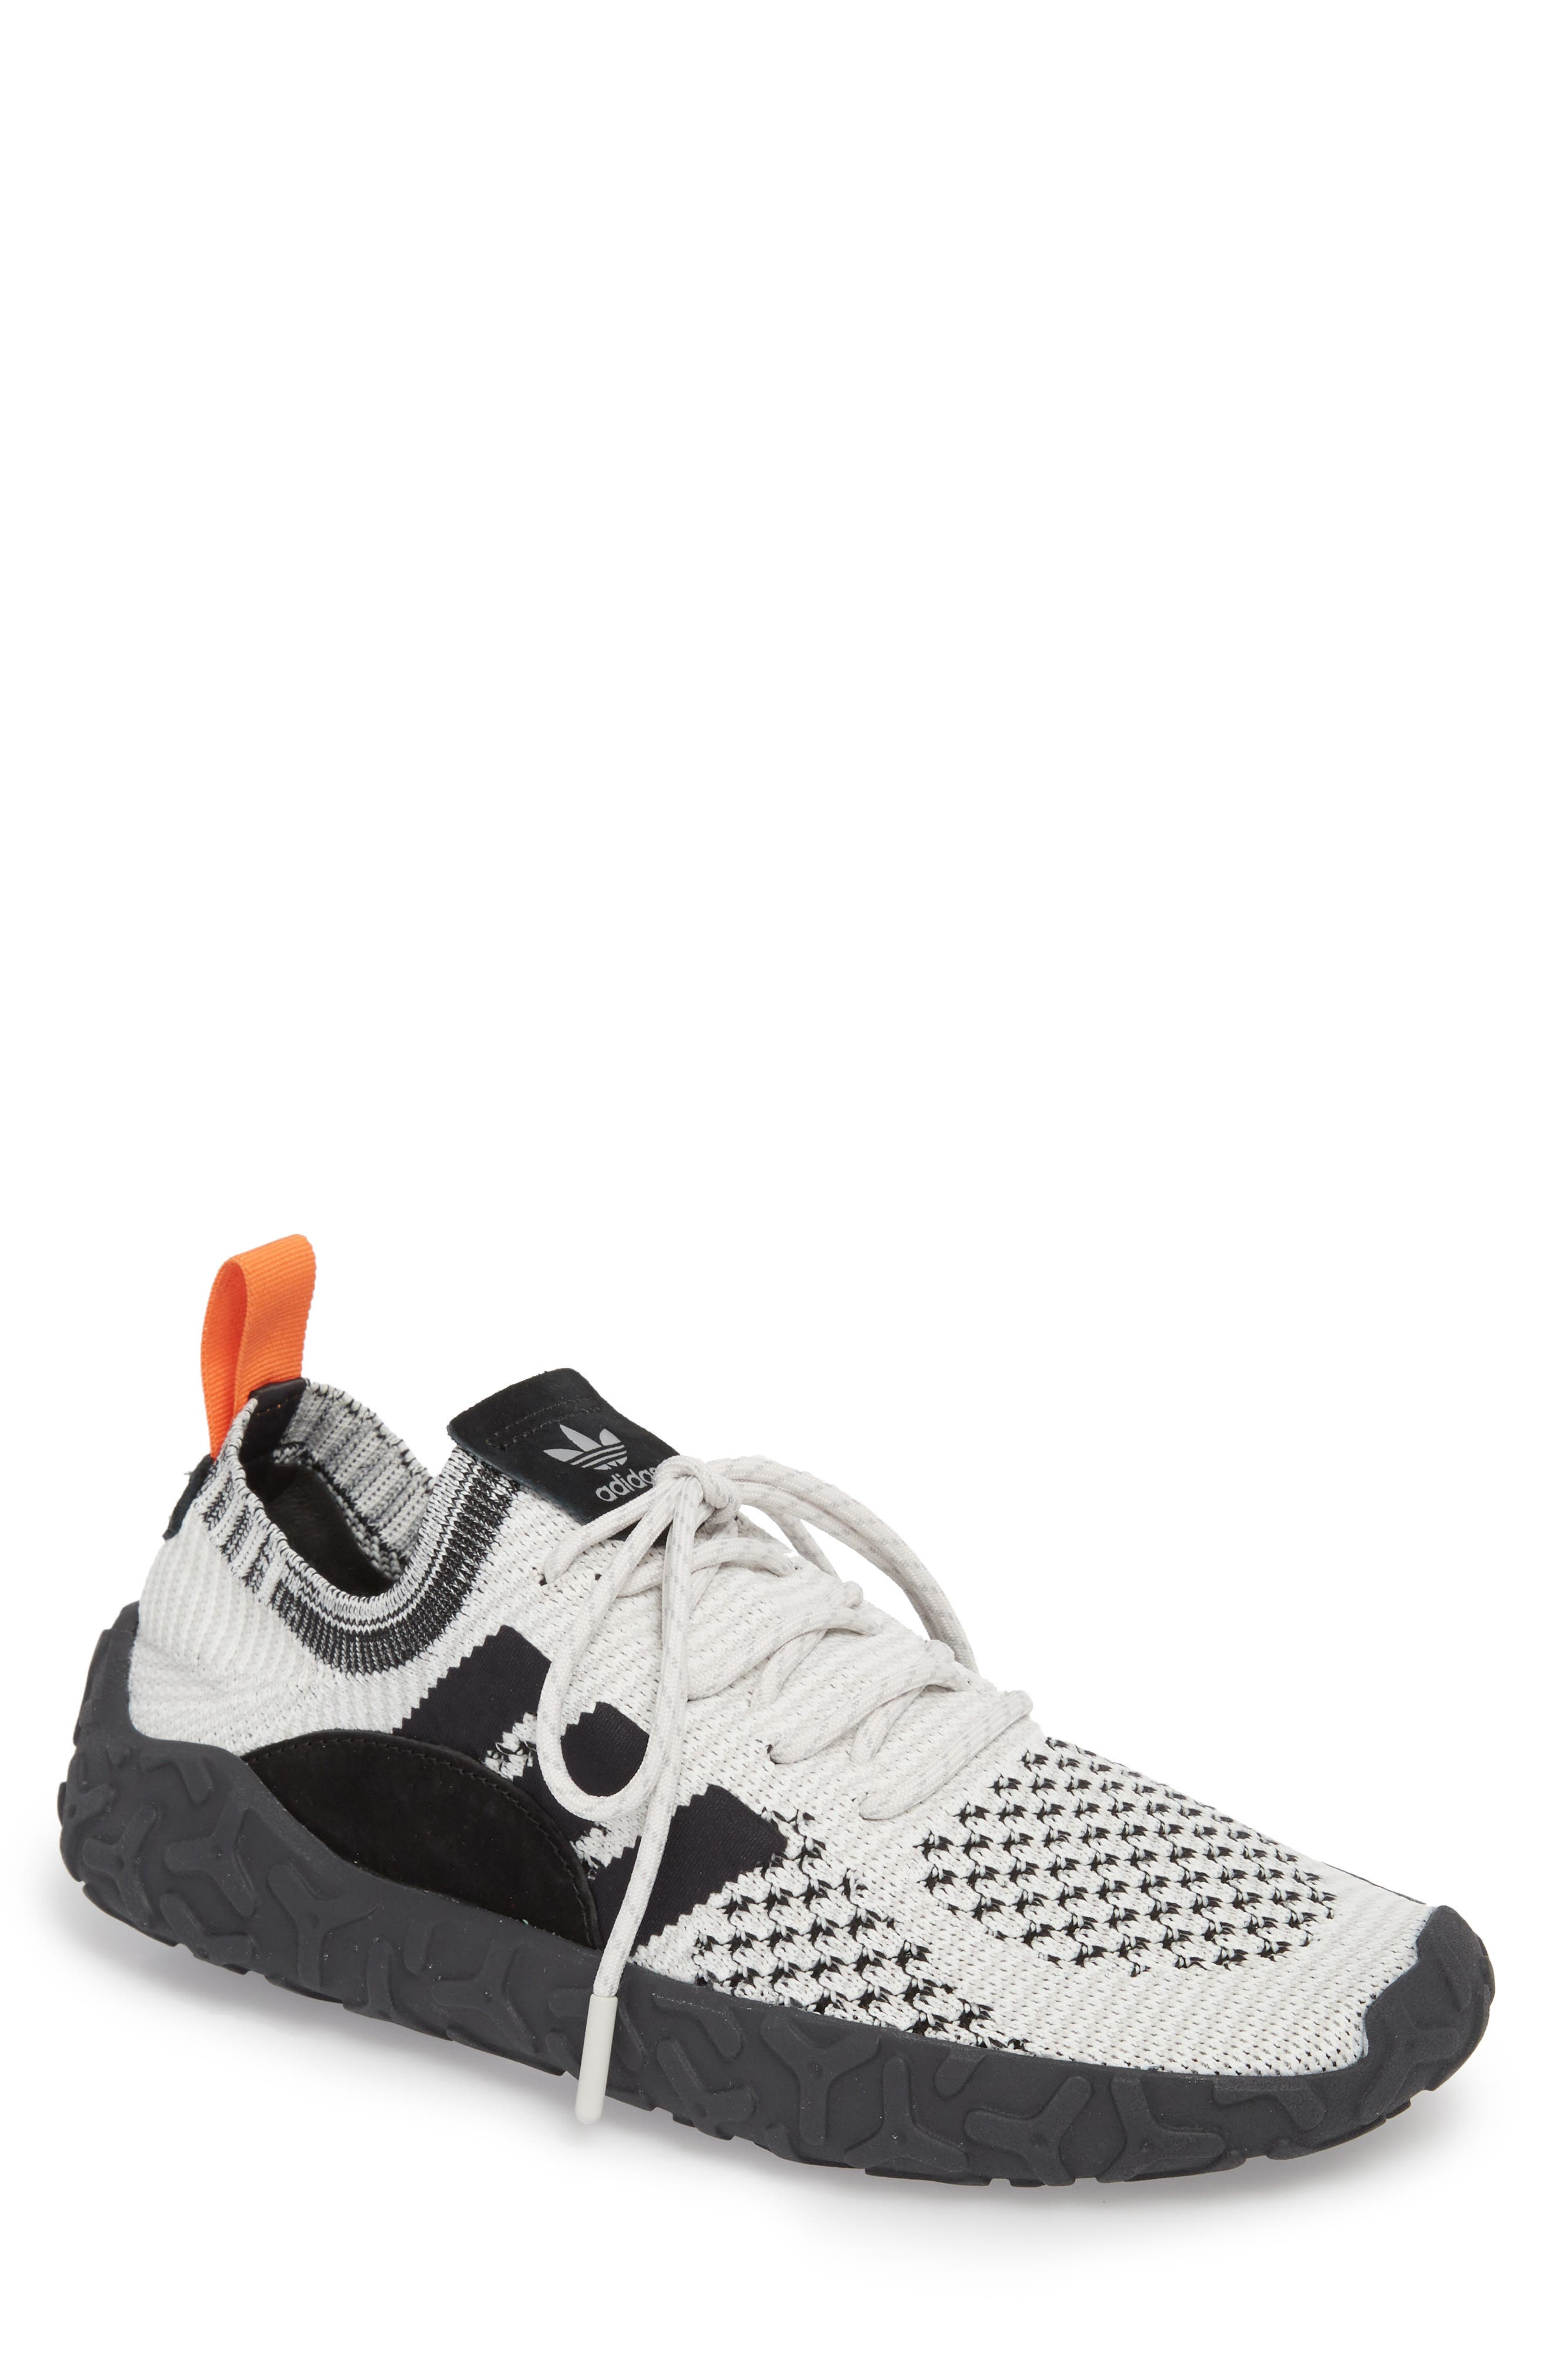 ADIDAS F22 Primeknit Sneaker, Main, color, 005